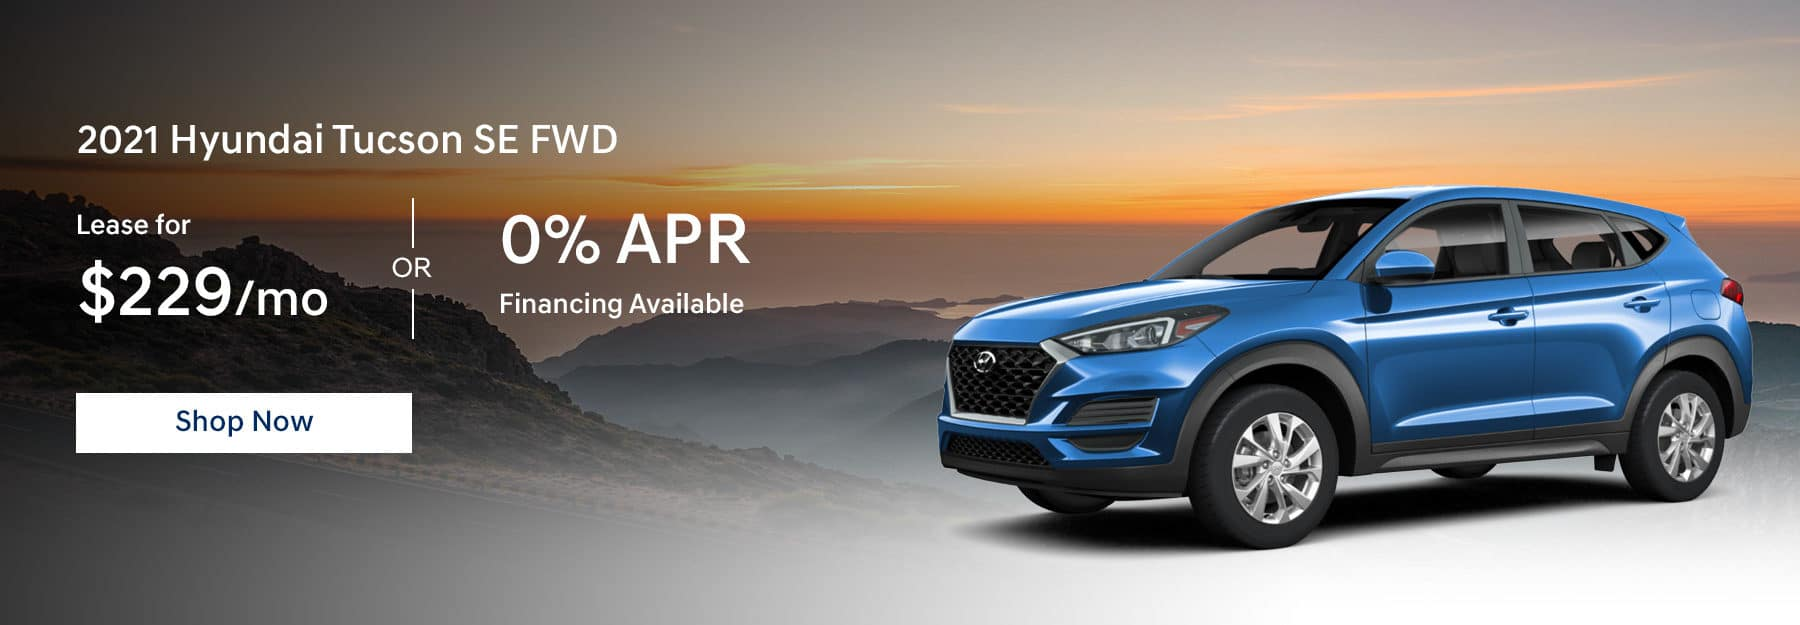 Hyundai Tucson Lease for $229 or 0% APR